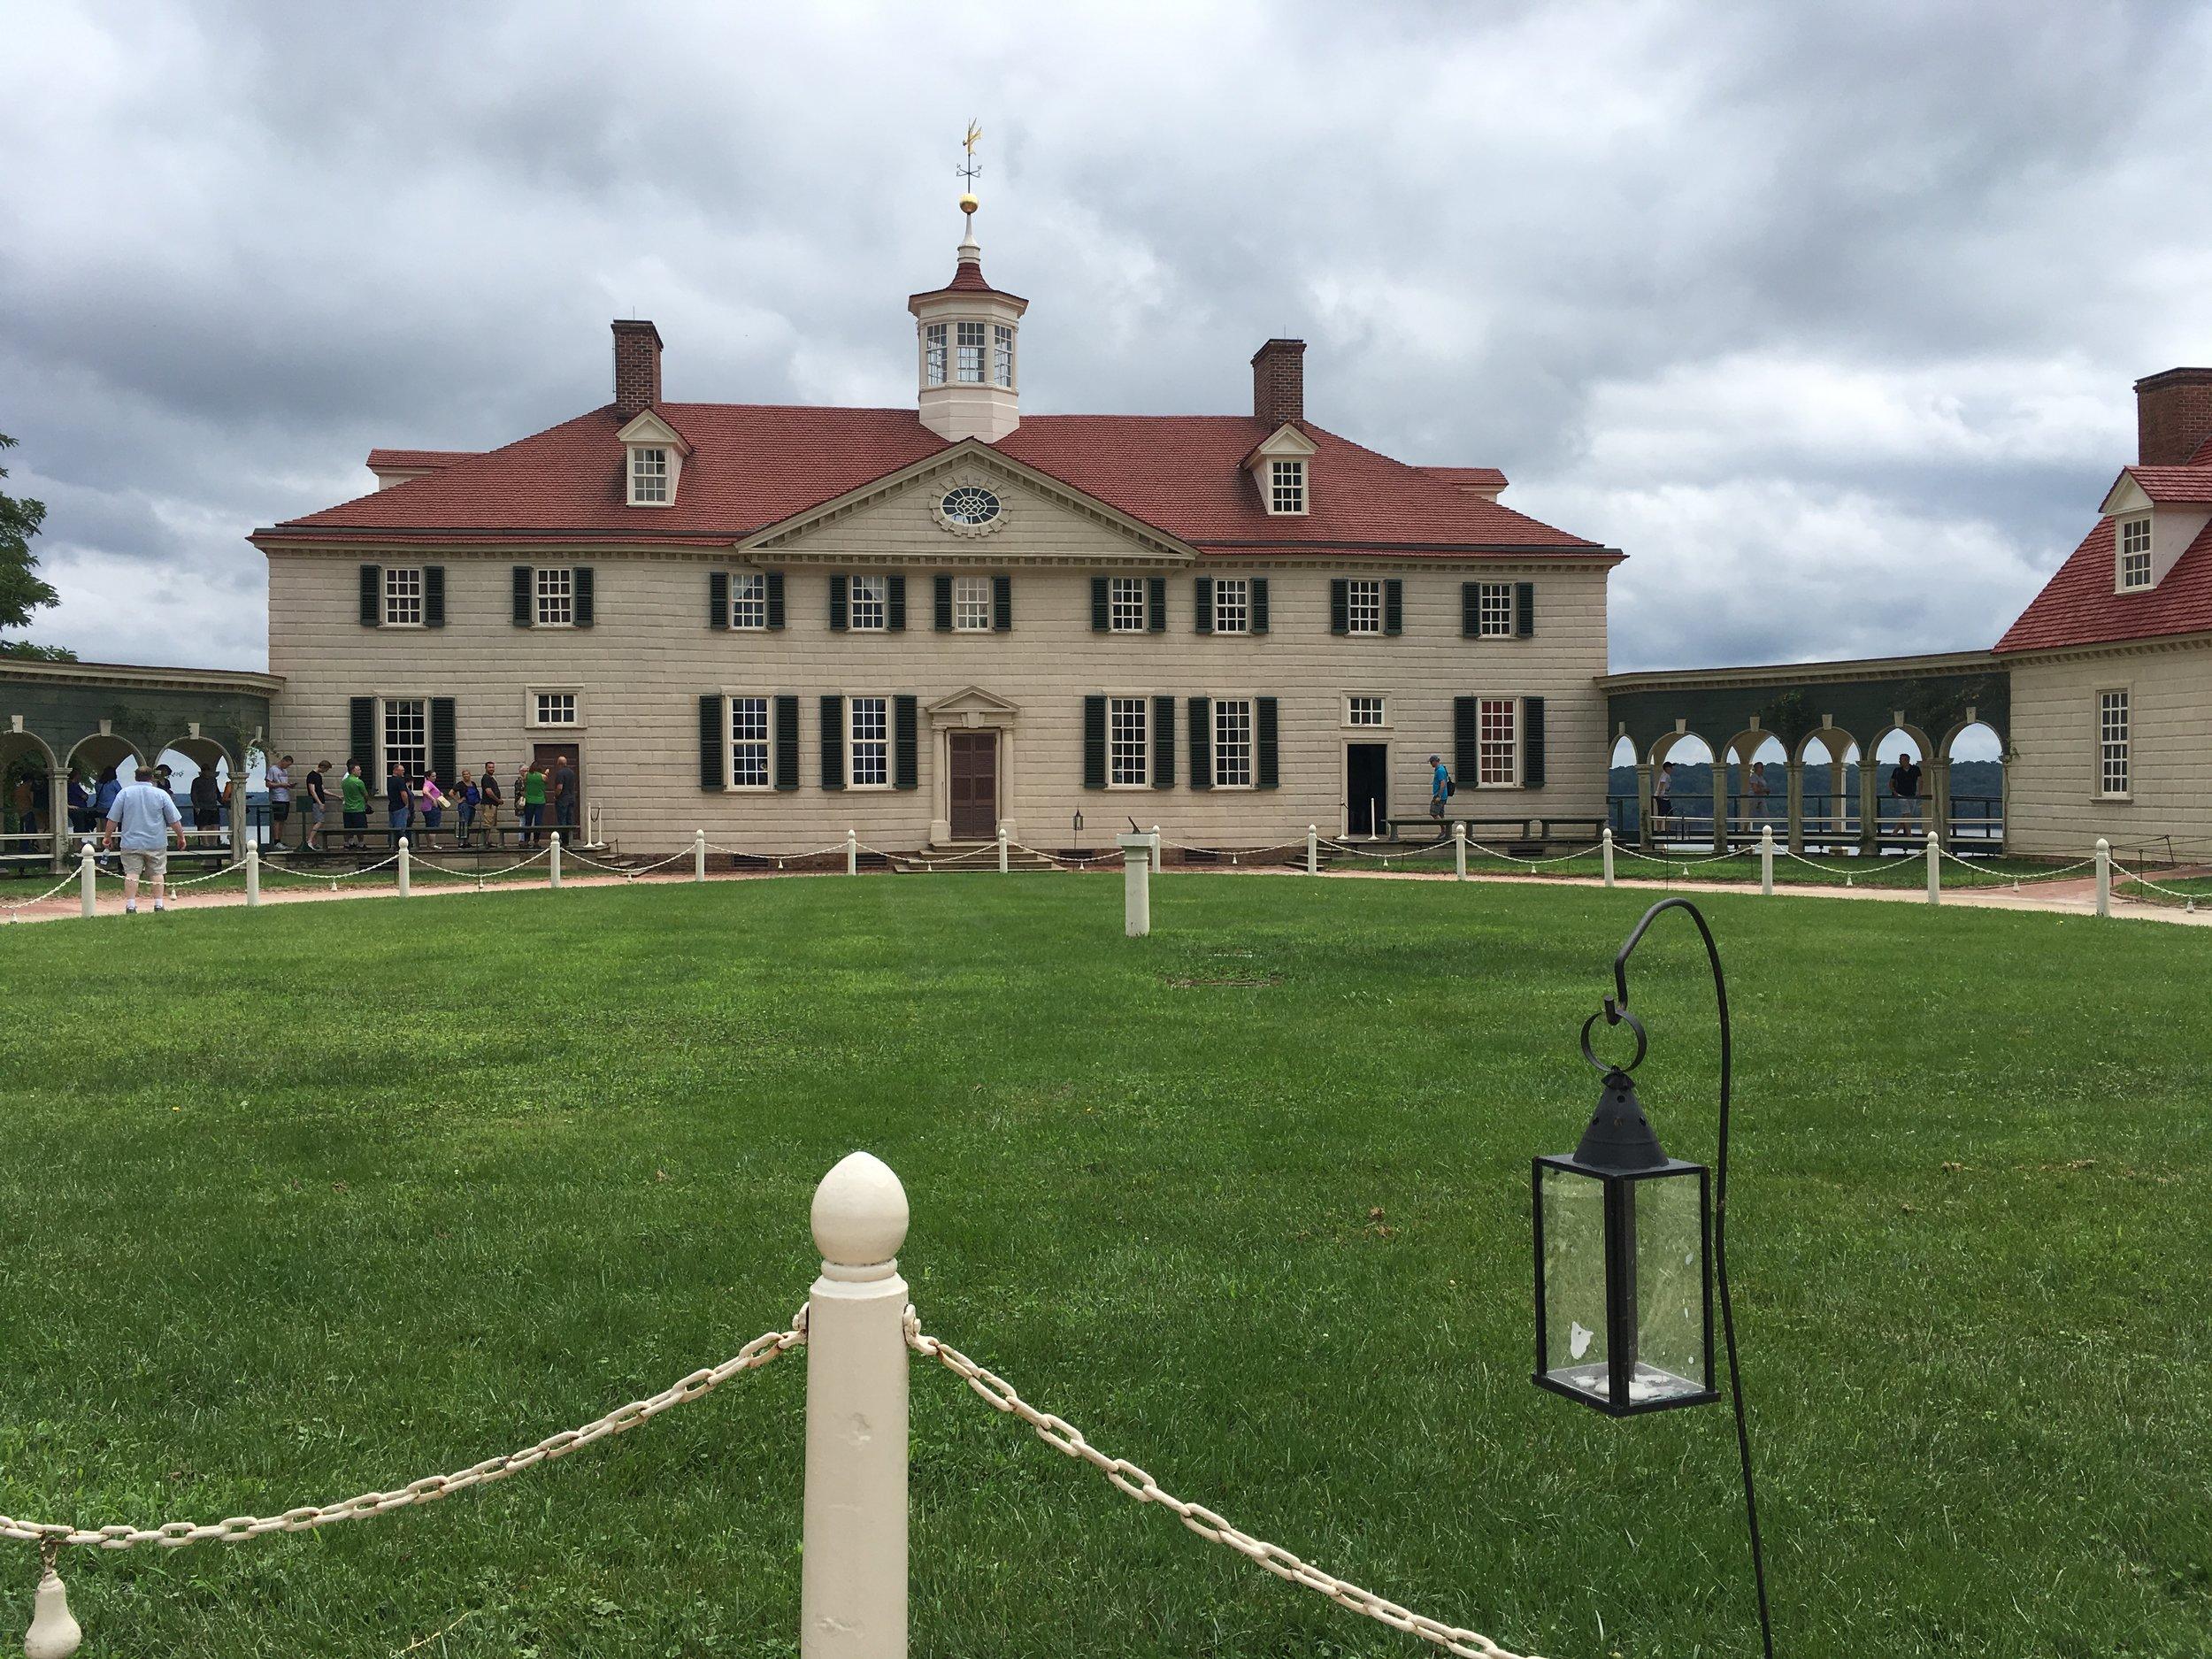 George Washington's Home